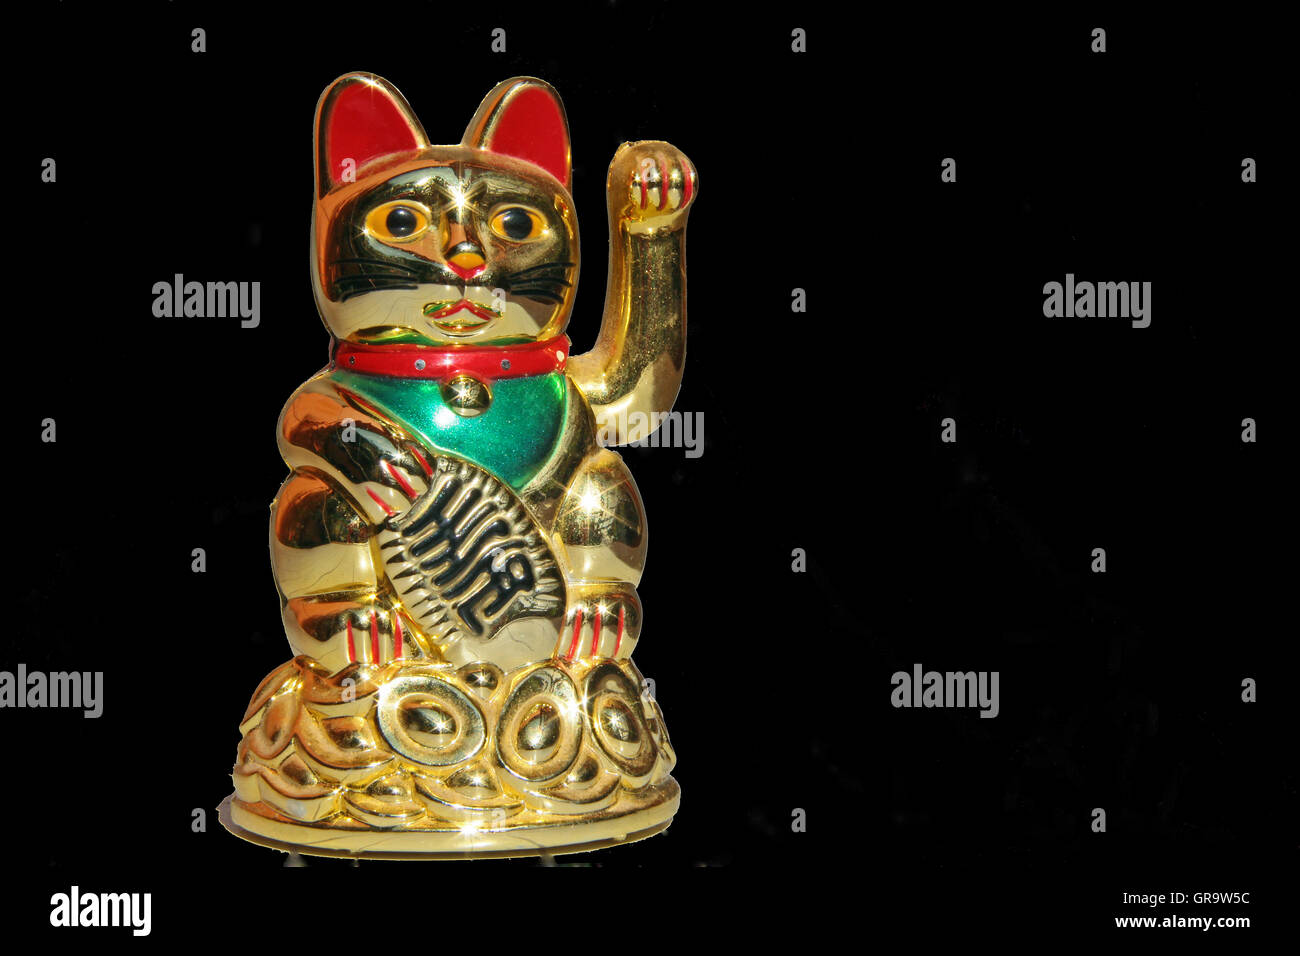 Bliss Cat - Stock Image